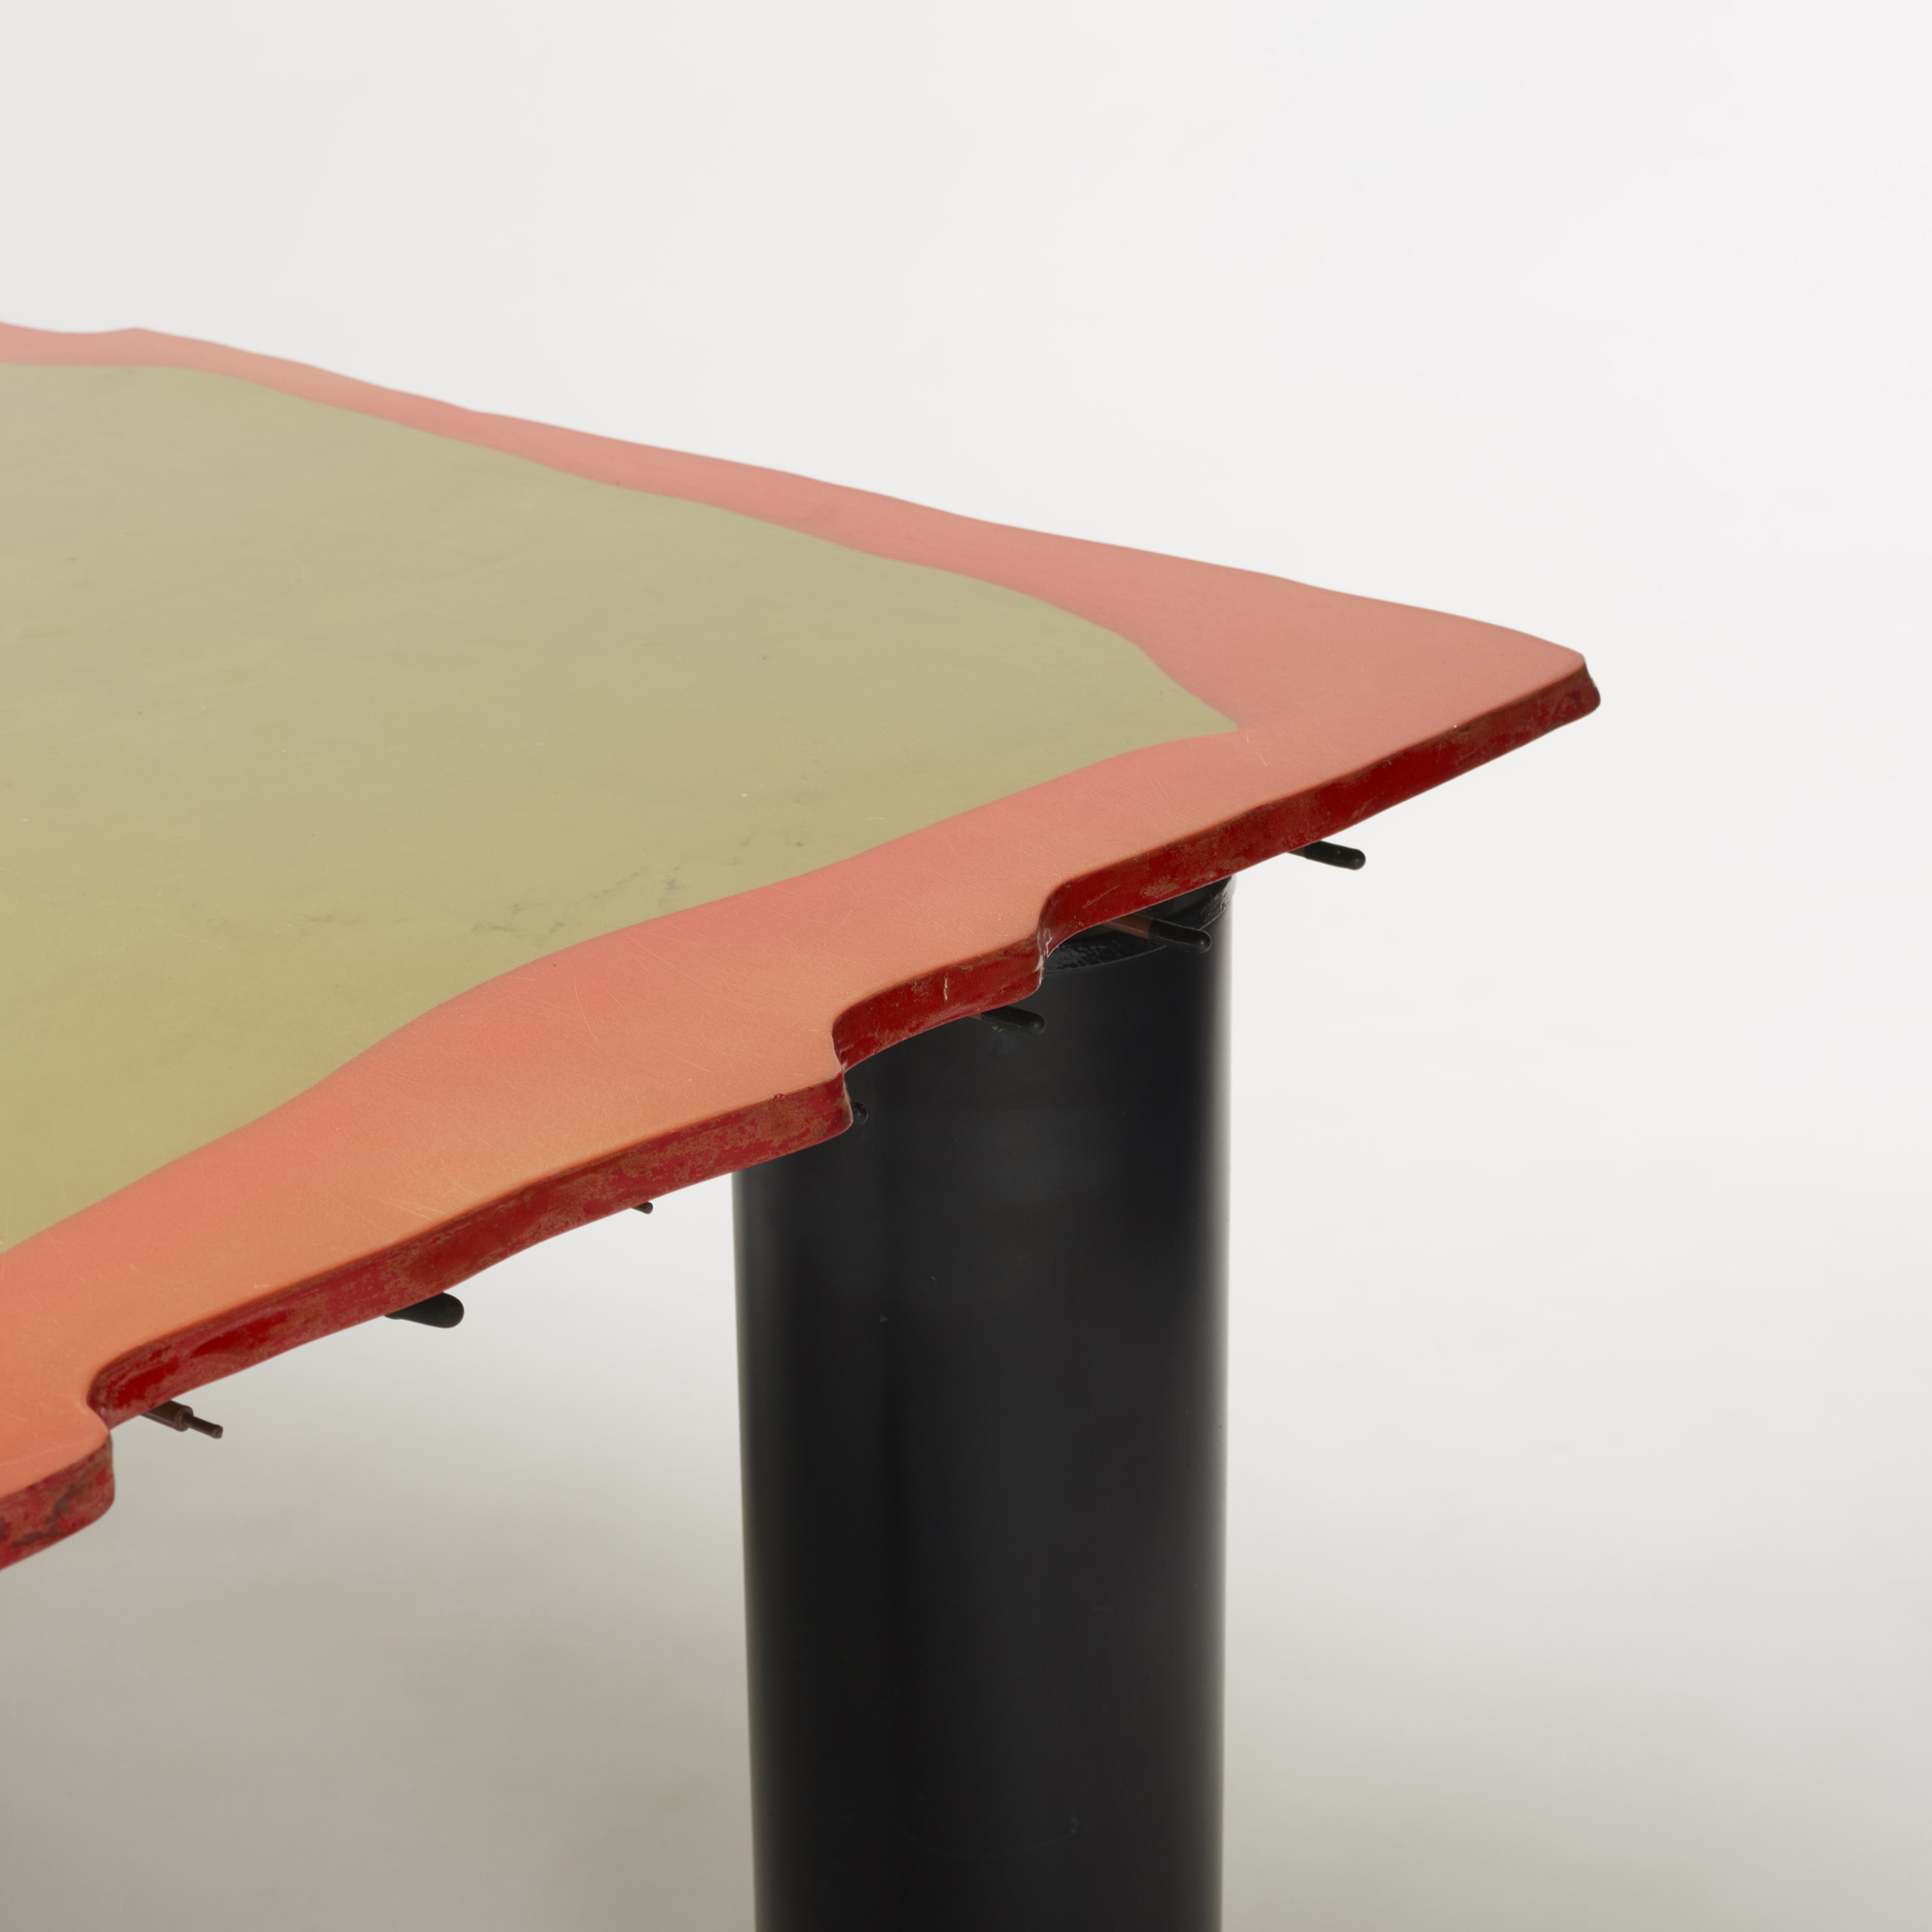 430: Gaetano Pesce / Sansone II dining table (3 of 3)